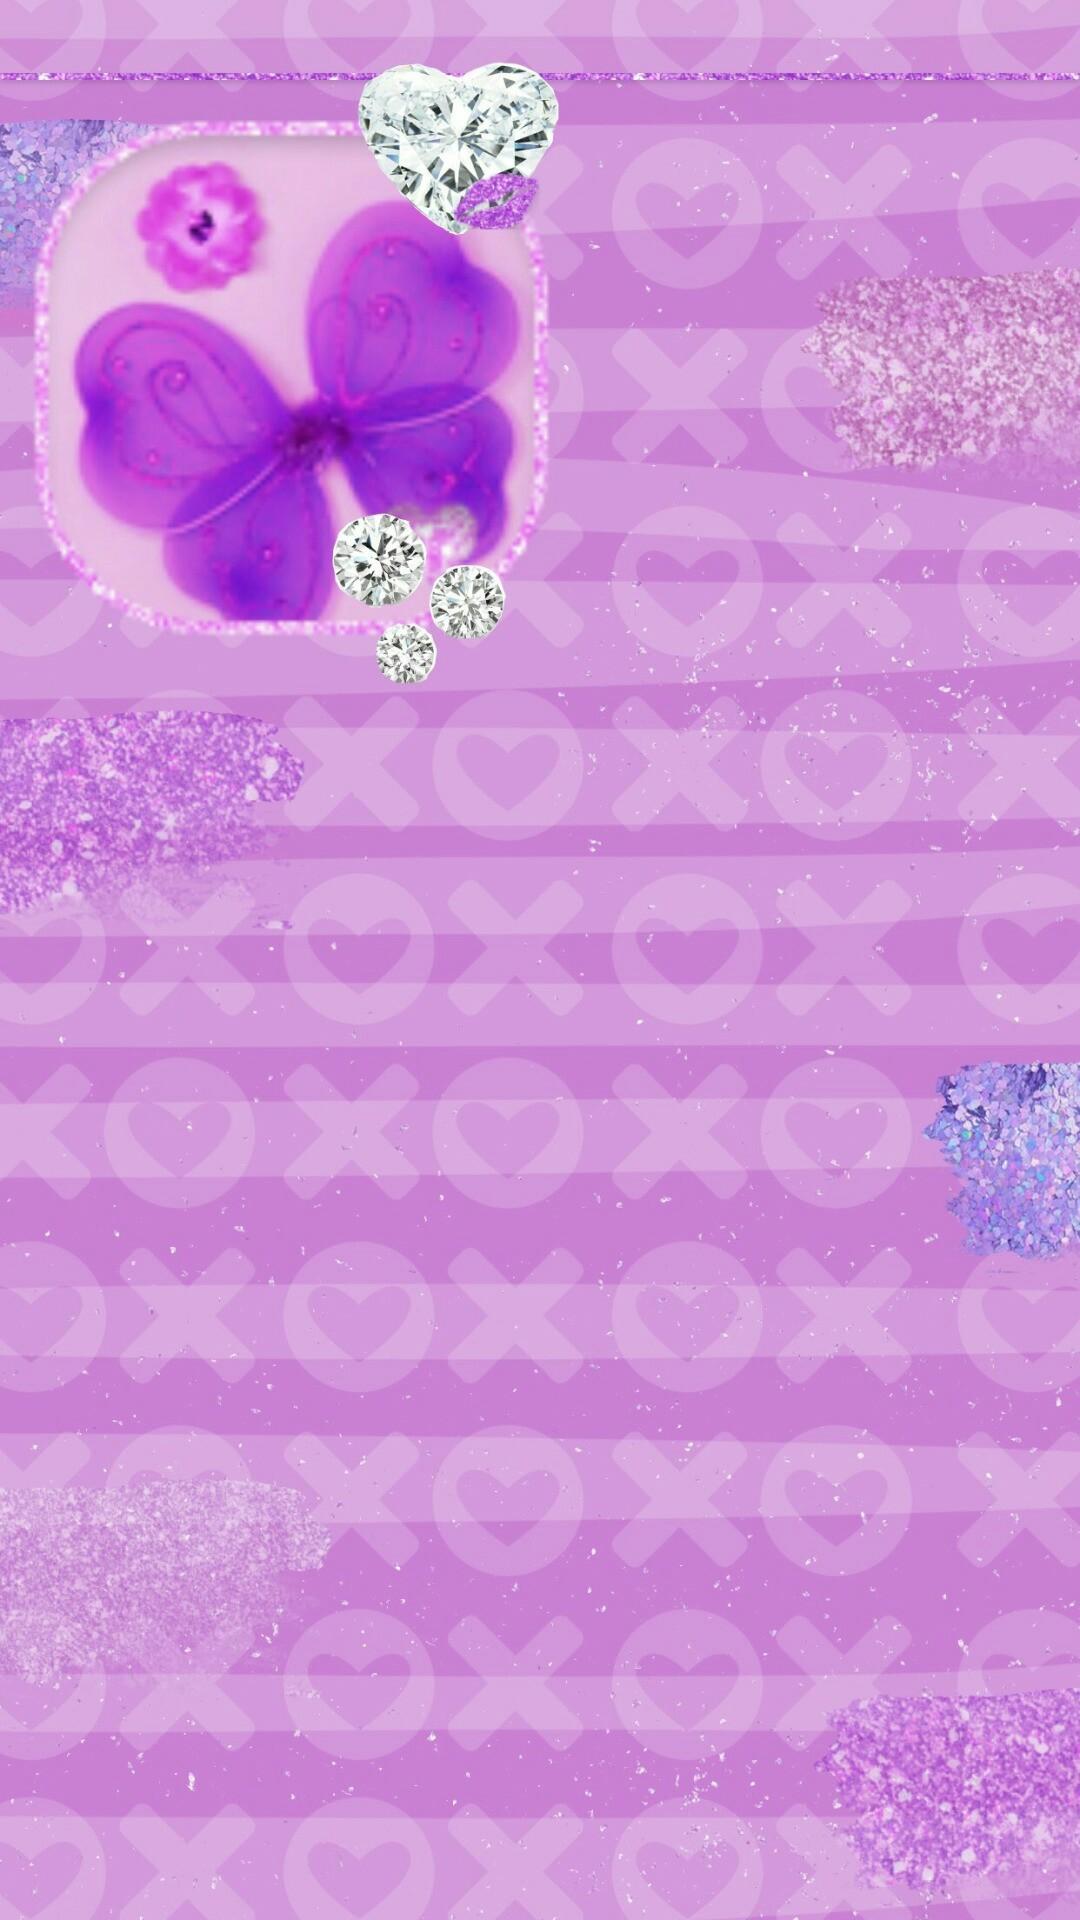 Glitter Wallpaper, Wallpaper Art, Purple Walls, Pretty Patterns, Phone  Wallpapers, Stationery, Kawaii, Kiss, Butterfly